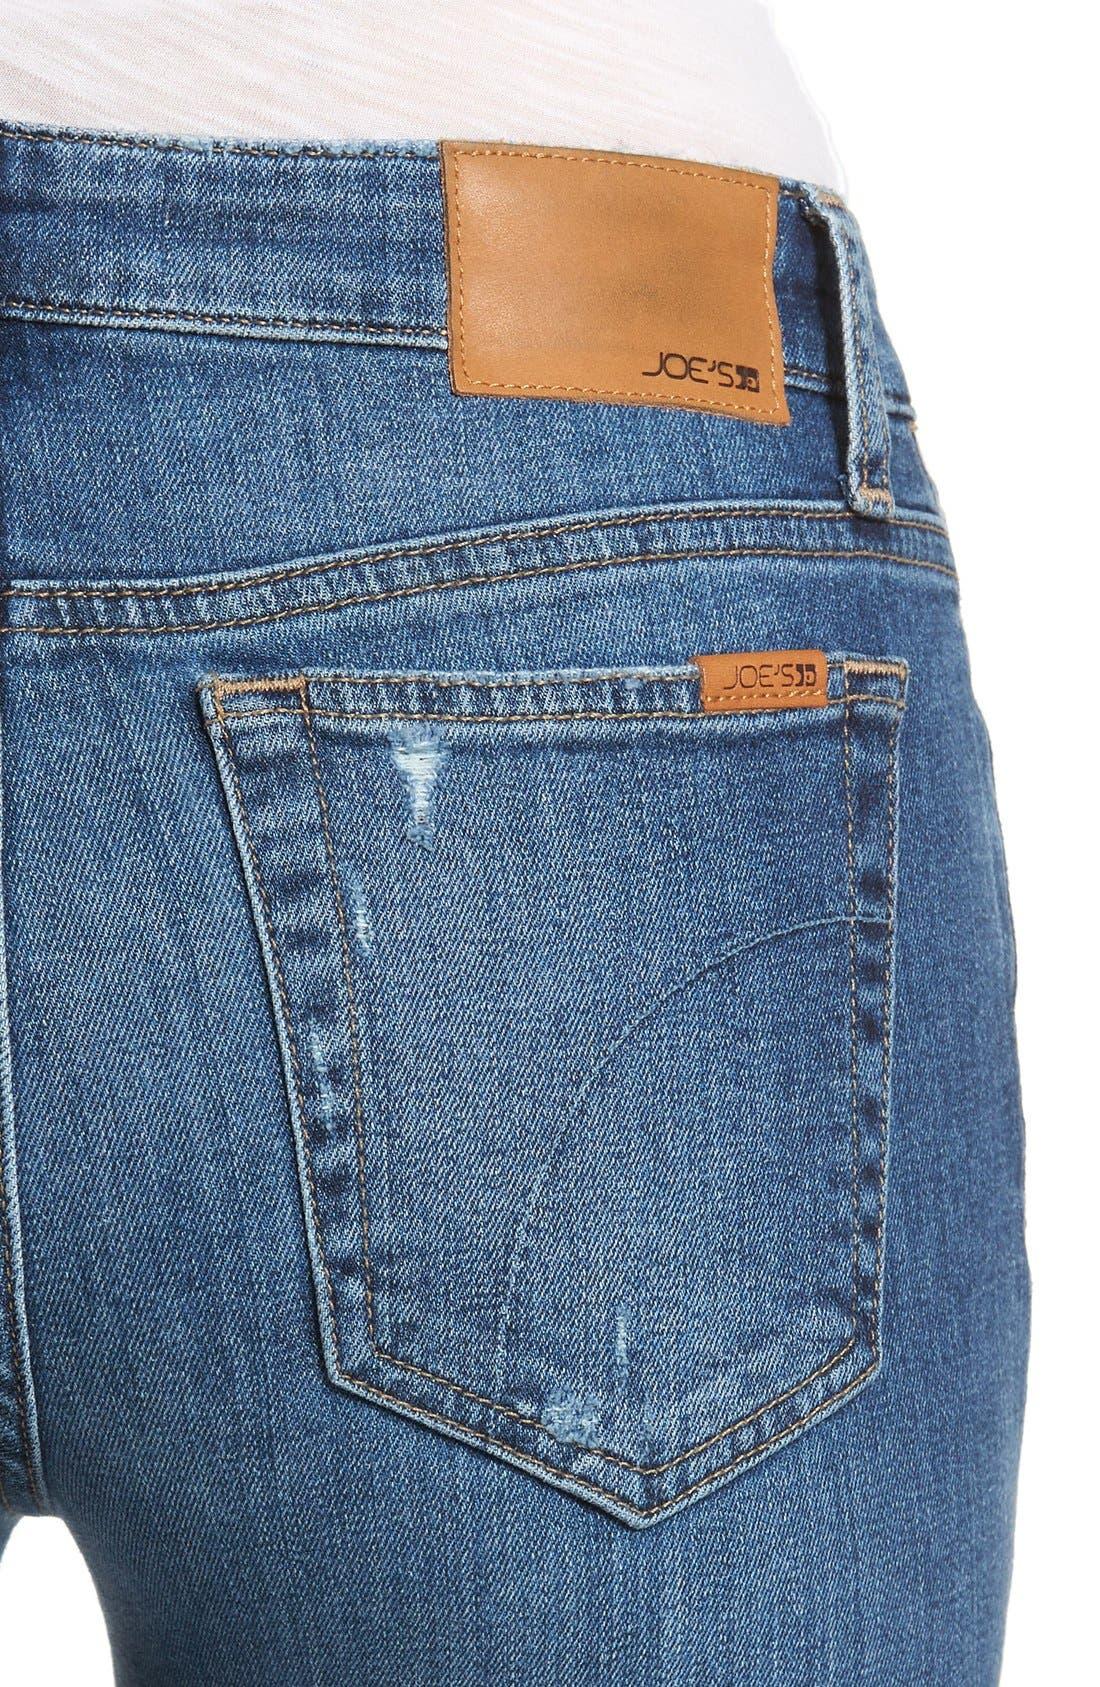 Cigarette Skinny Jeans,                             Alternate thumbnail 2, color,                             410